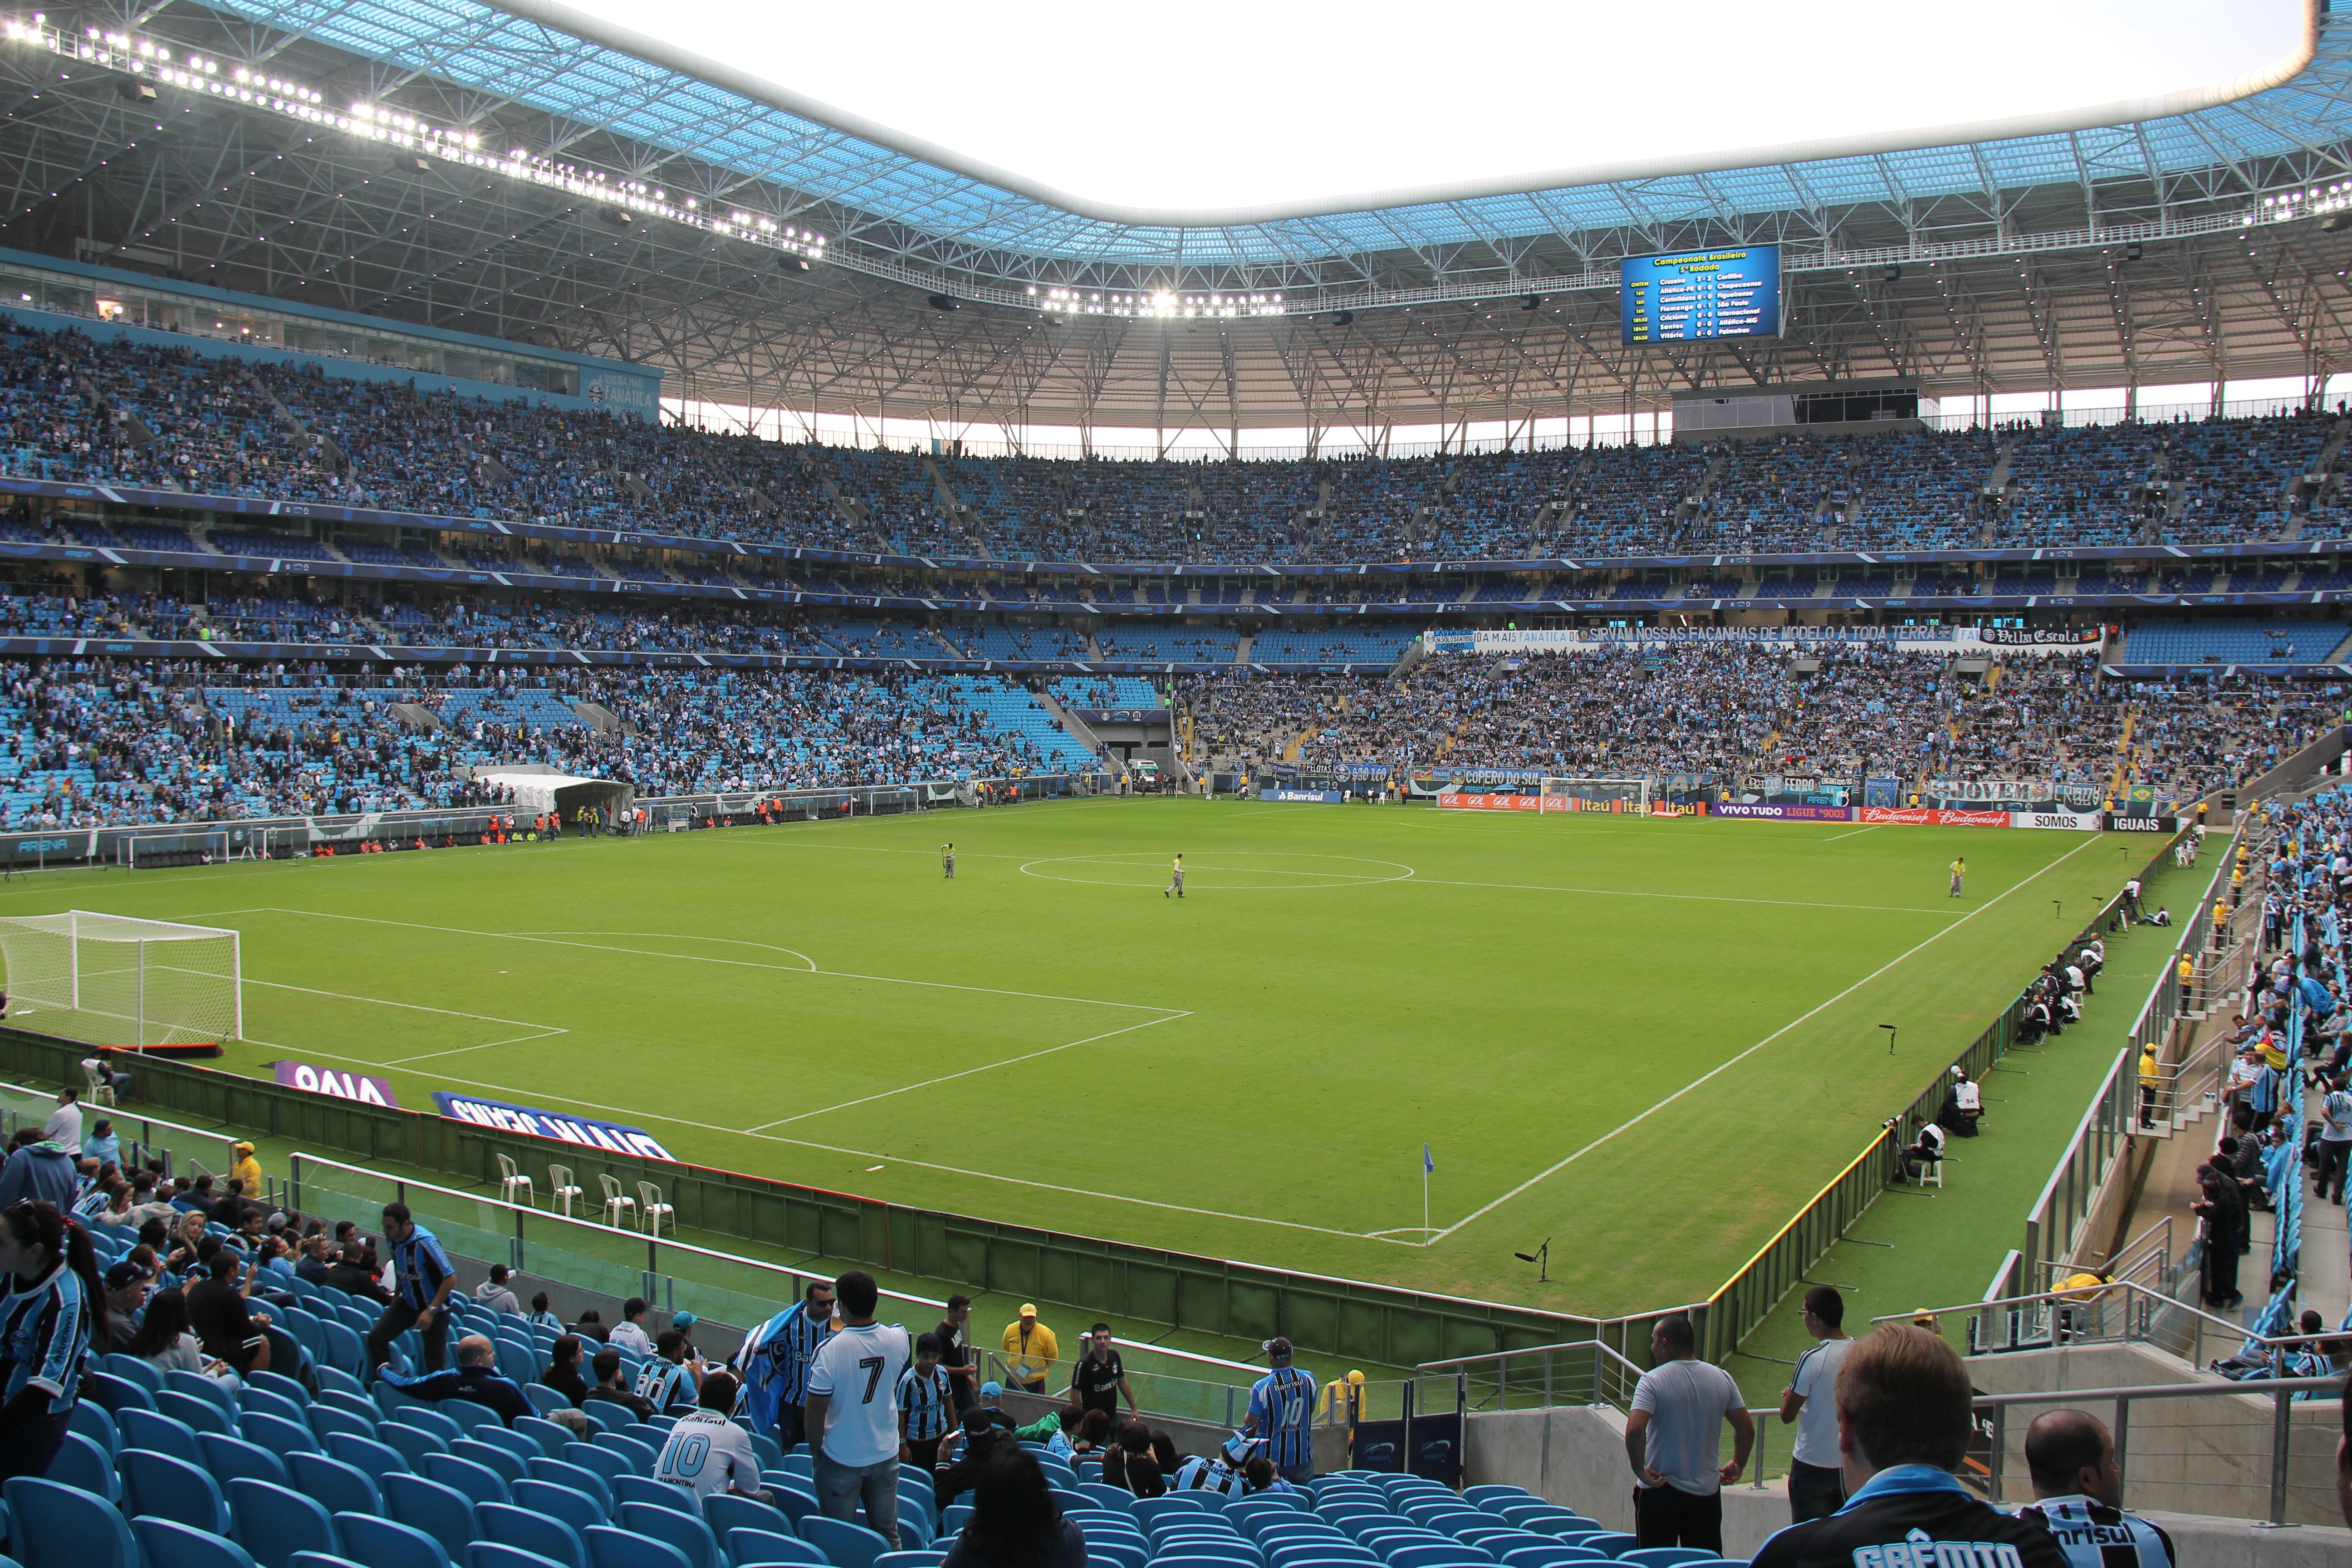 7de5b4b546e8f Porto Alegre – Wikipédia